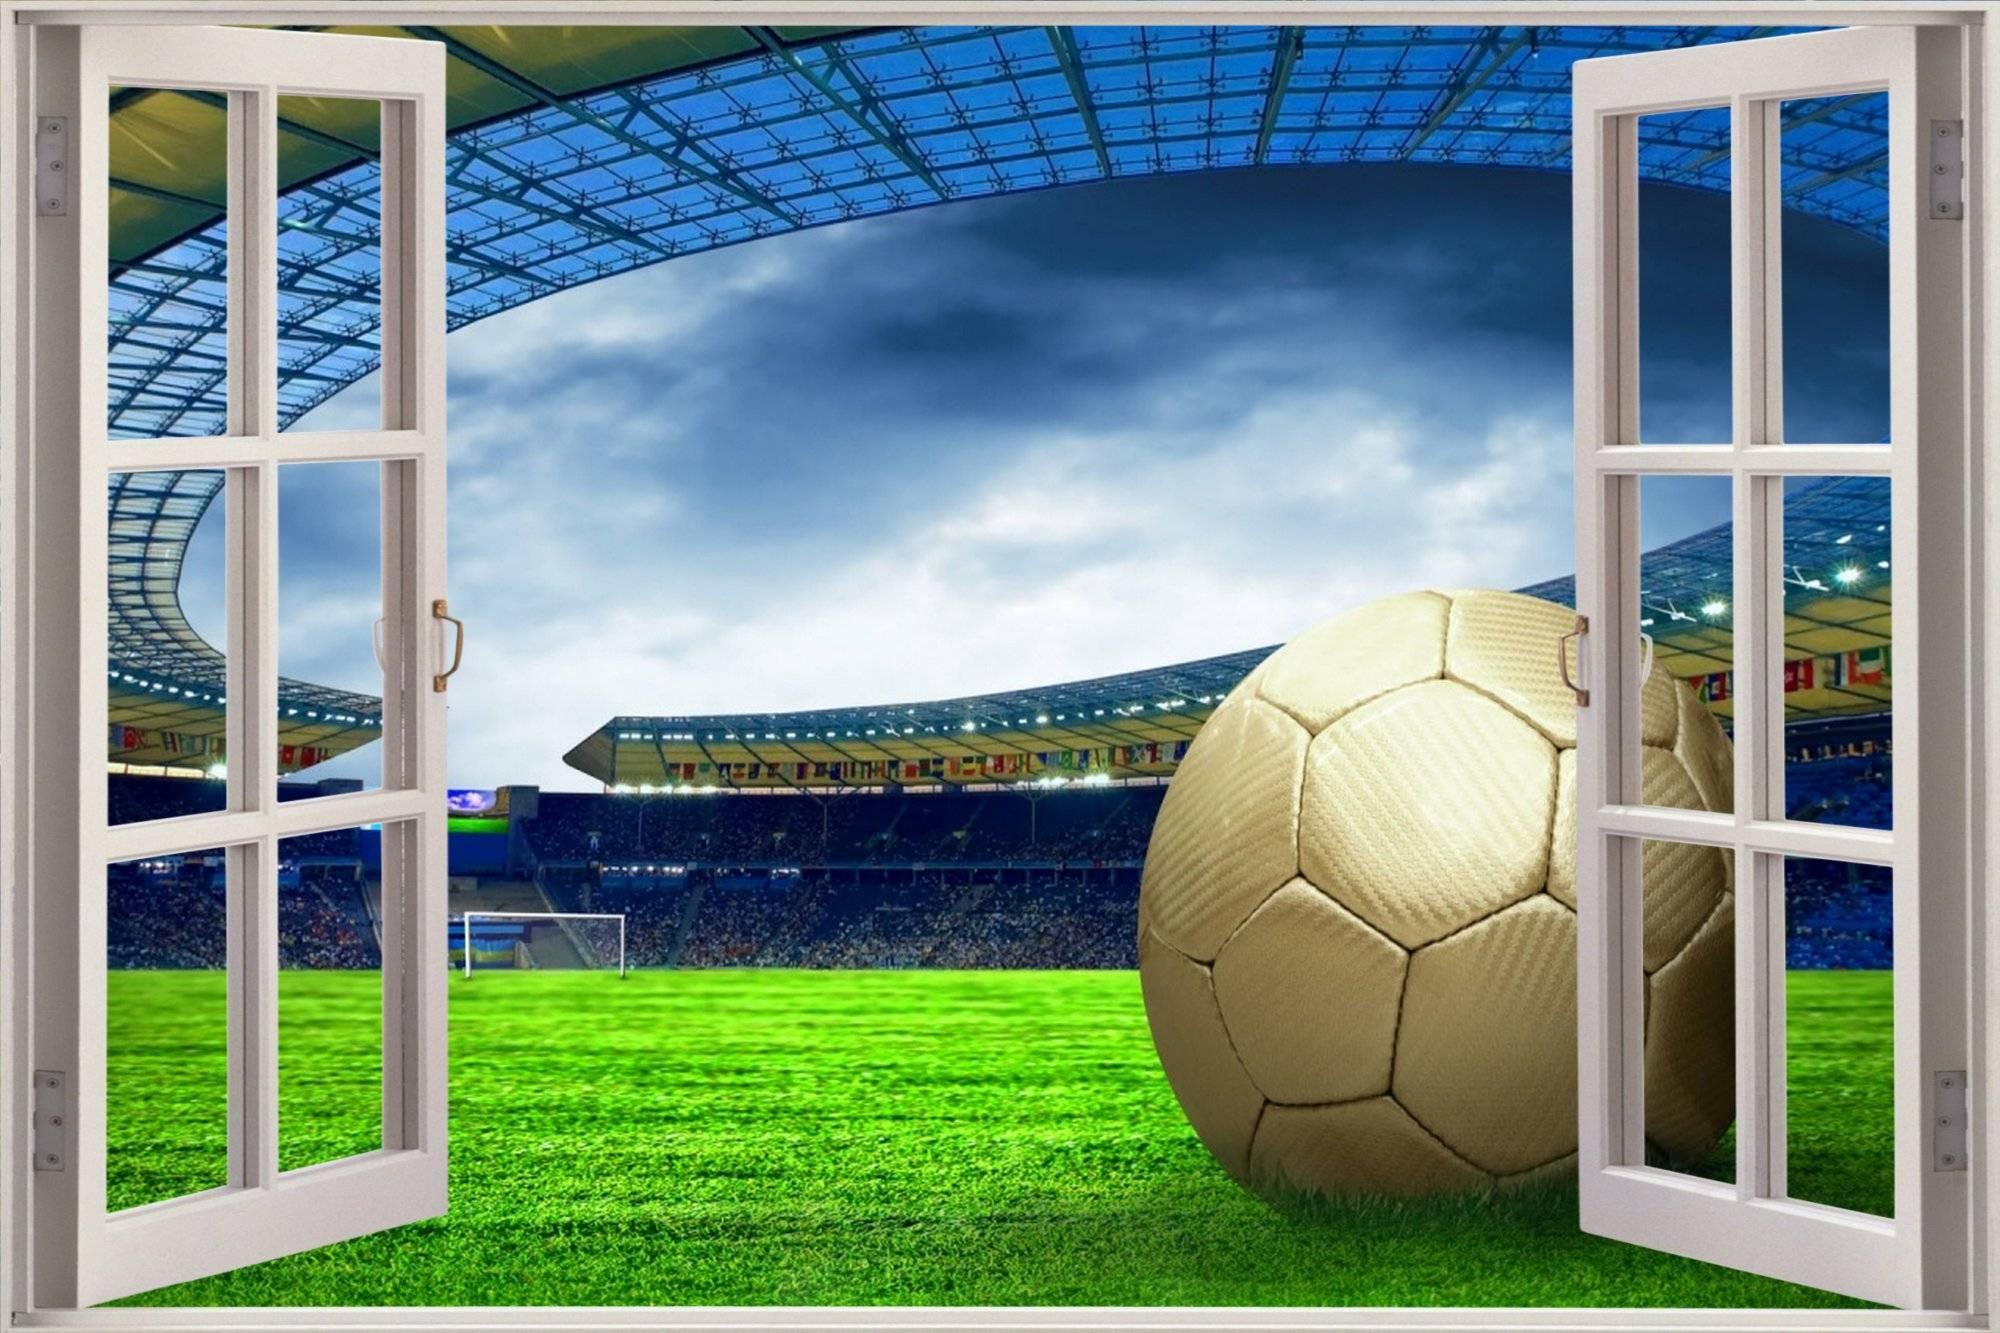 3d Wall Art Football | Wallartideas In Most Recently Released Football 3d Wall Art (View 2 of 20)